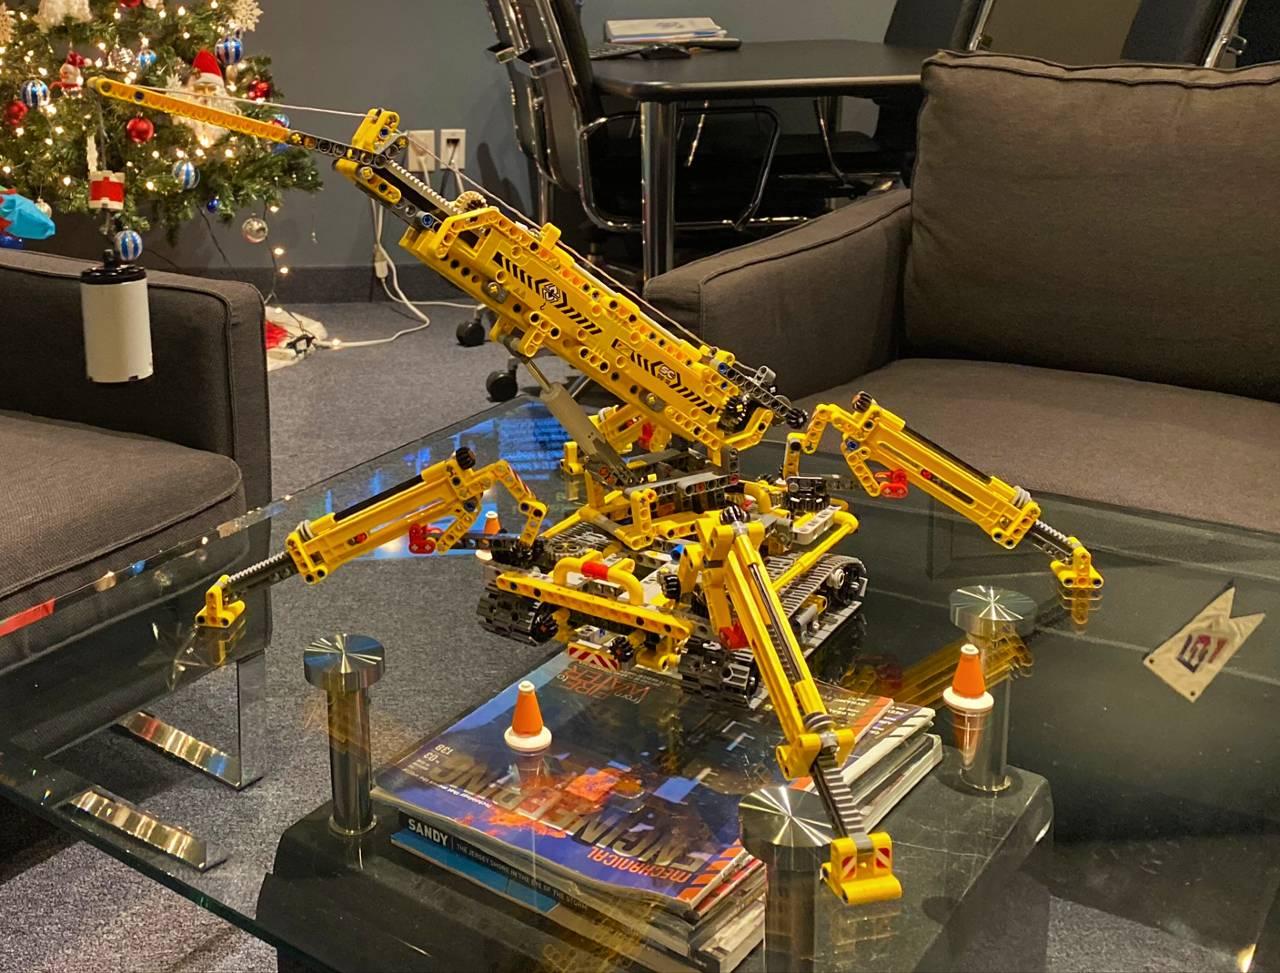 Lego Crane Set Assembled In Office